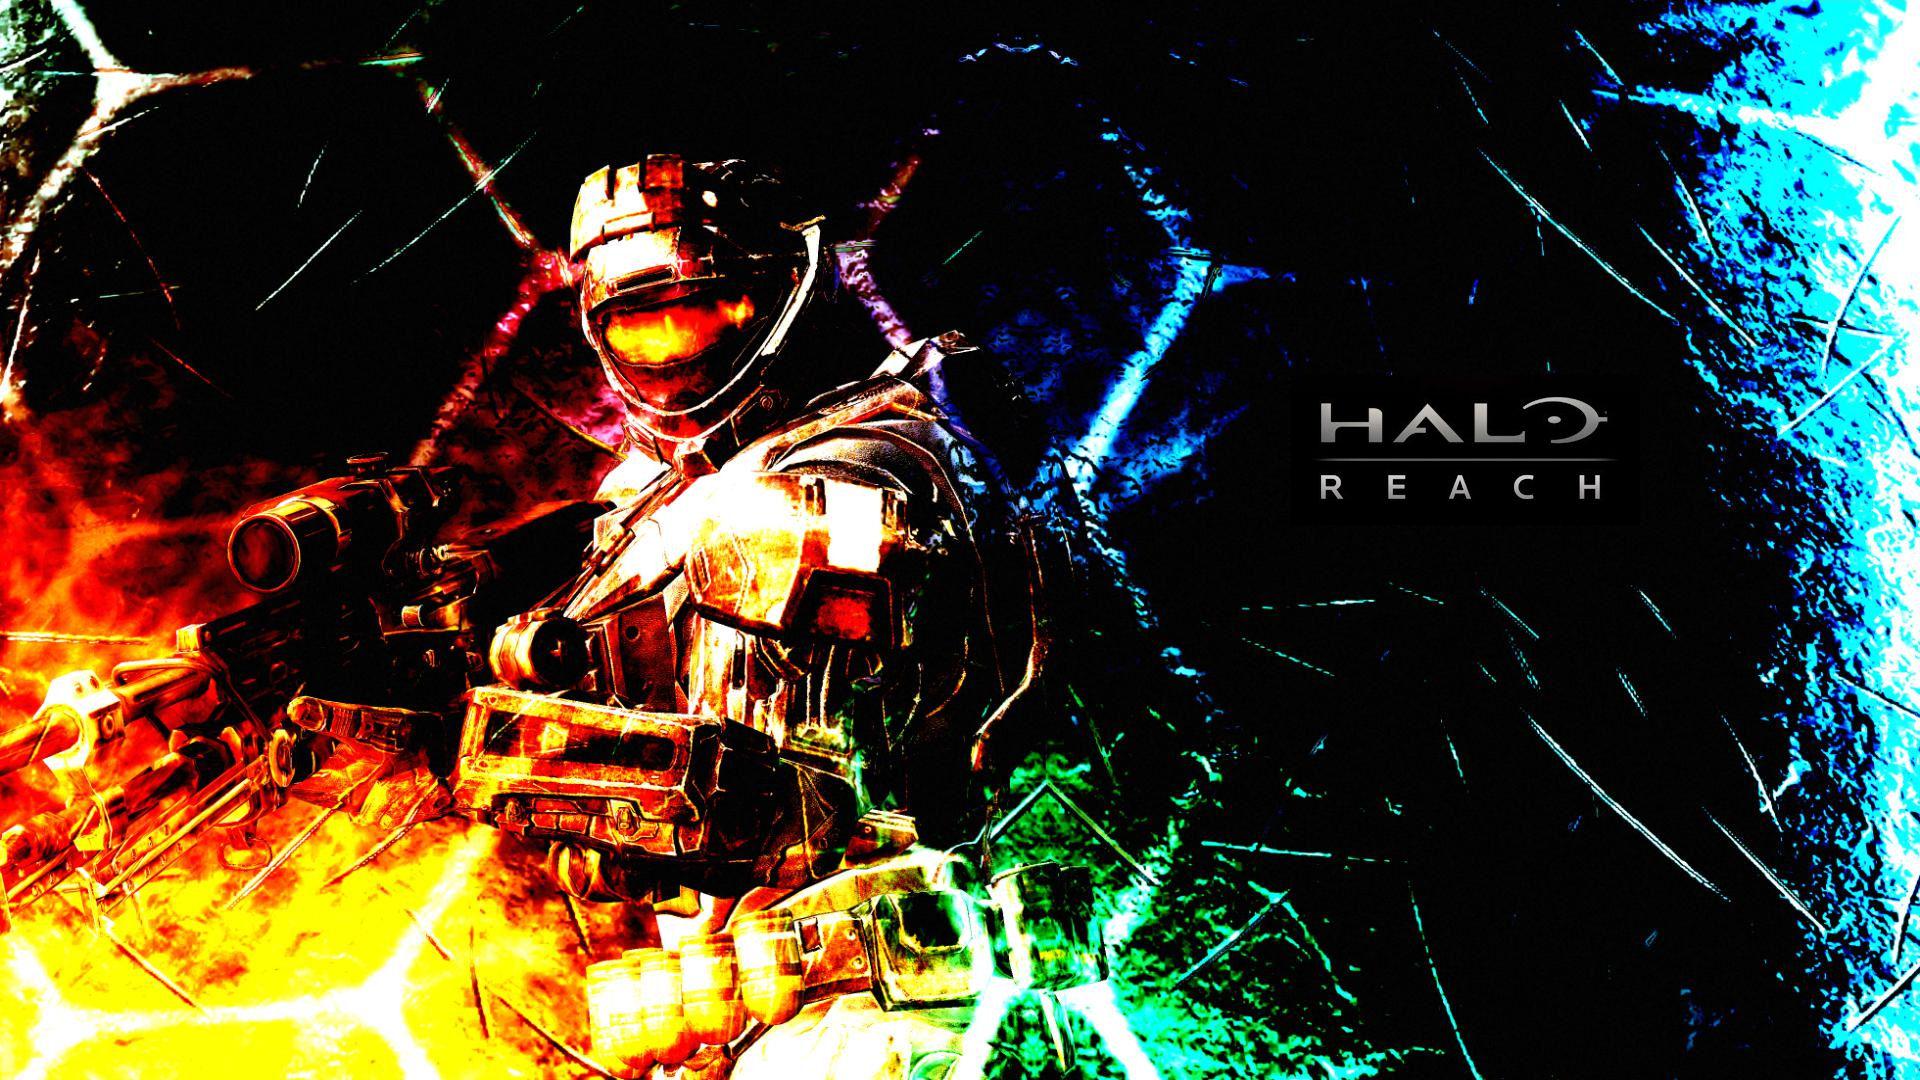 Cool Halo Backgrounds - WallpaperSafari